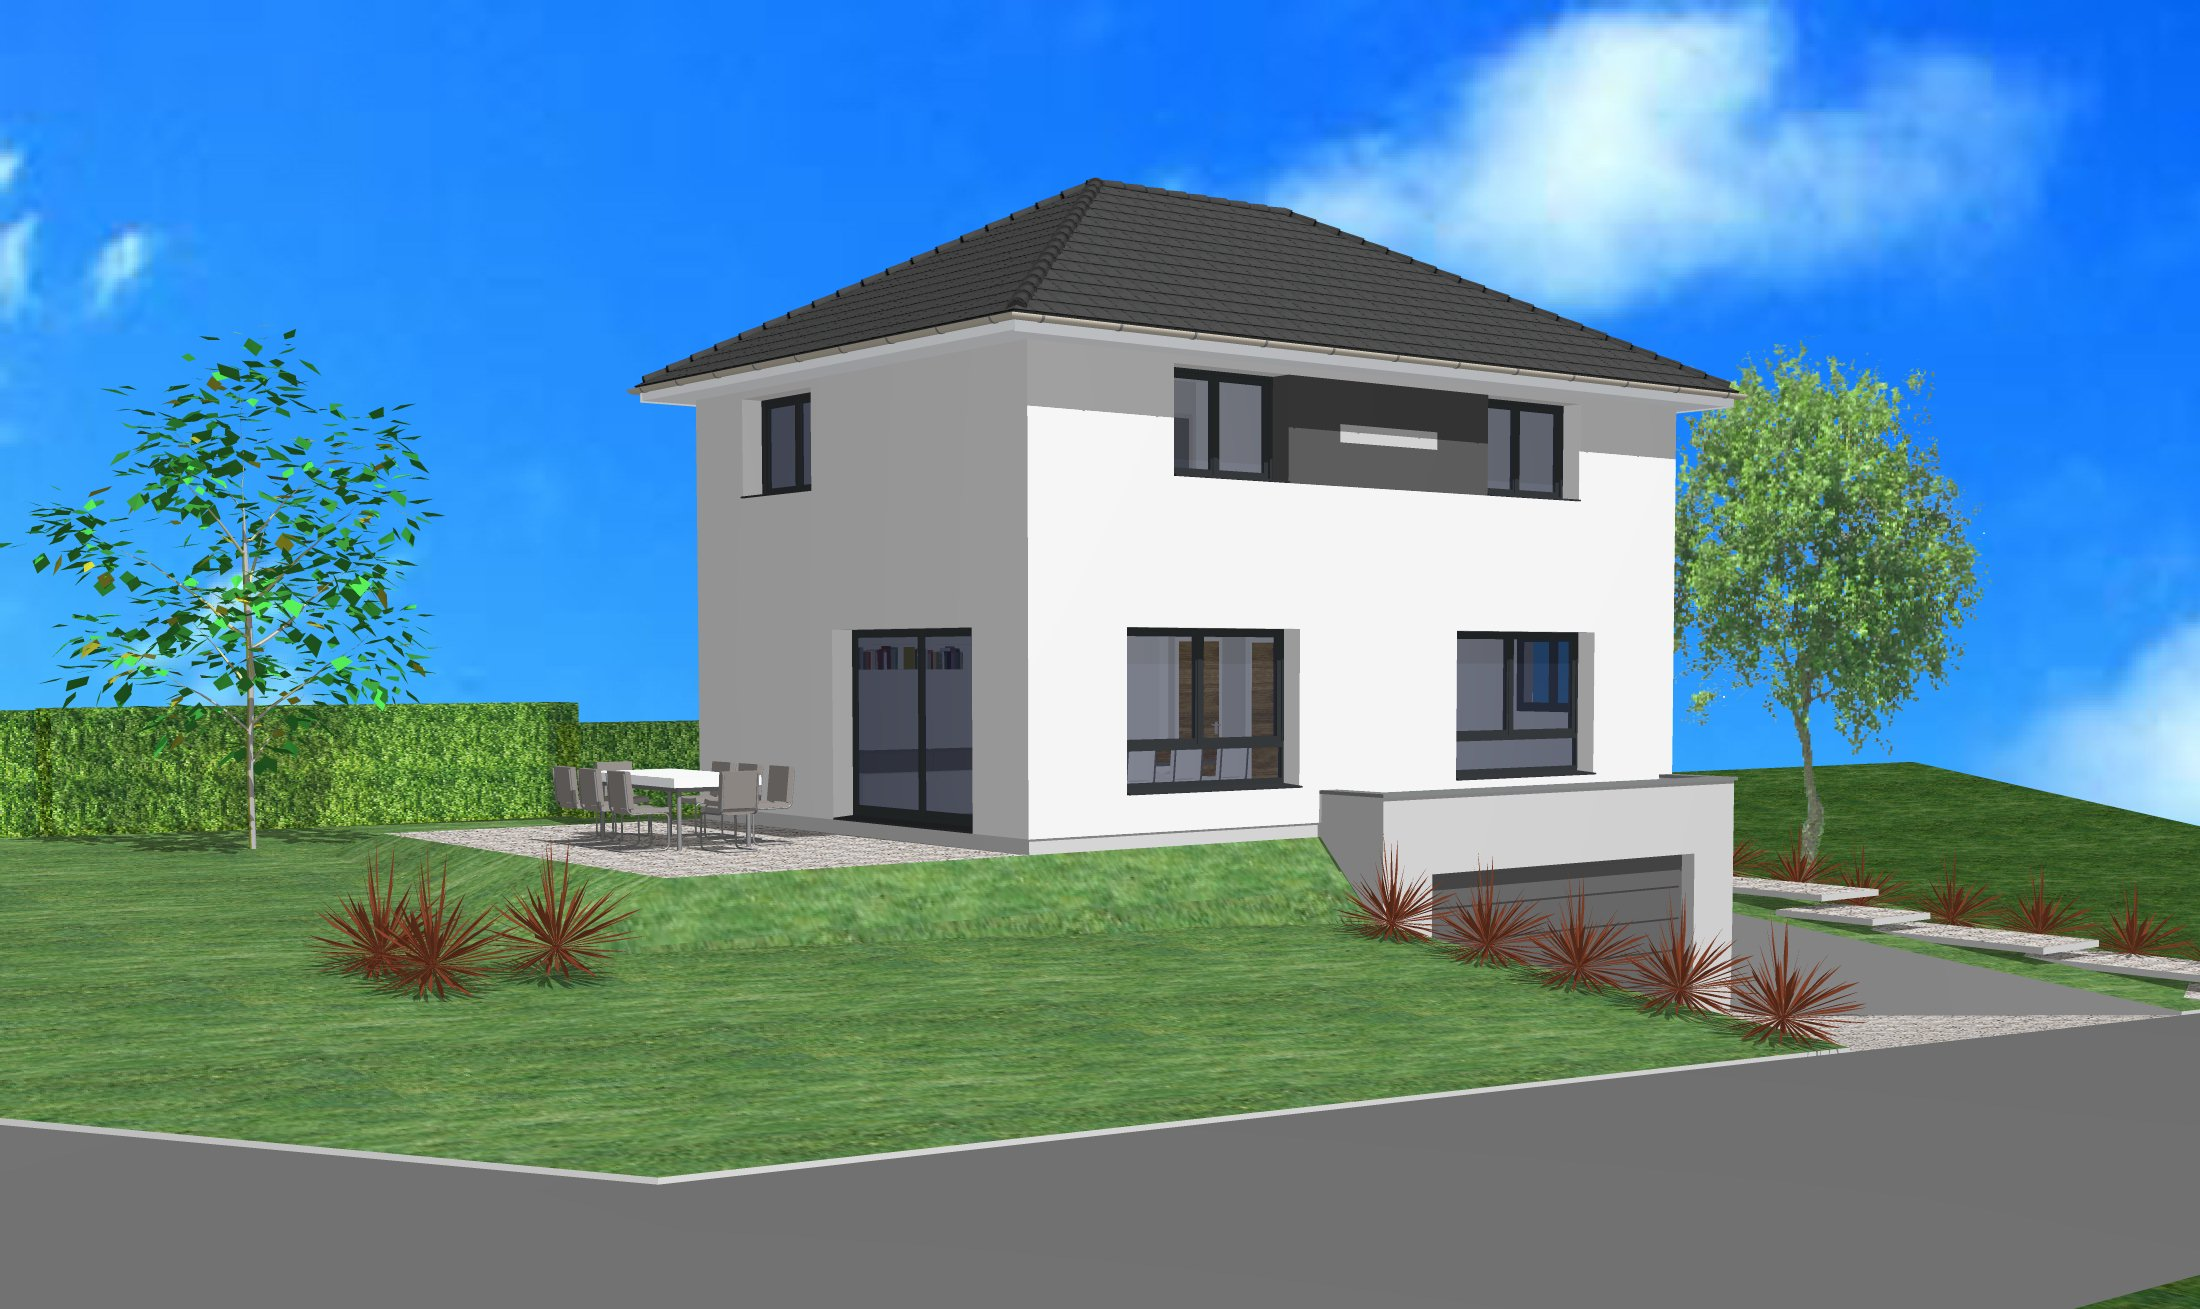 Maisons + Terrains du constructeur CREAGES • 100 m² • UFFHEIM